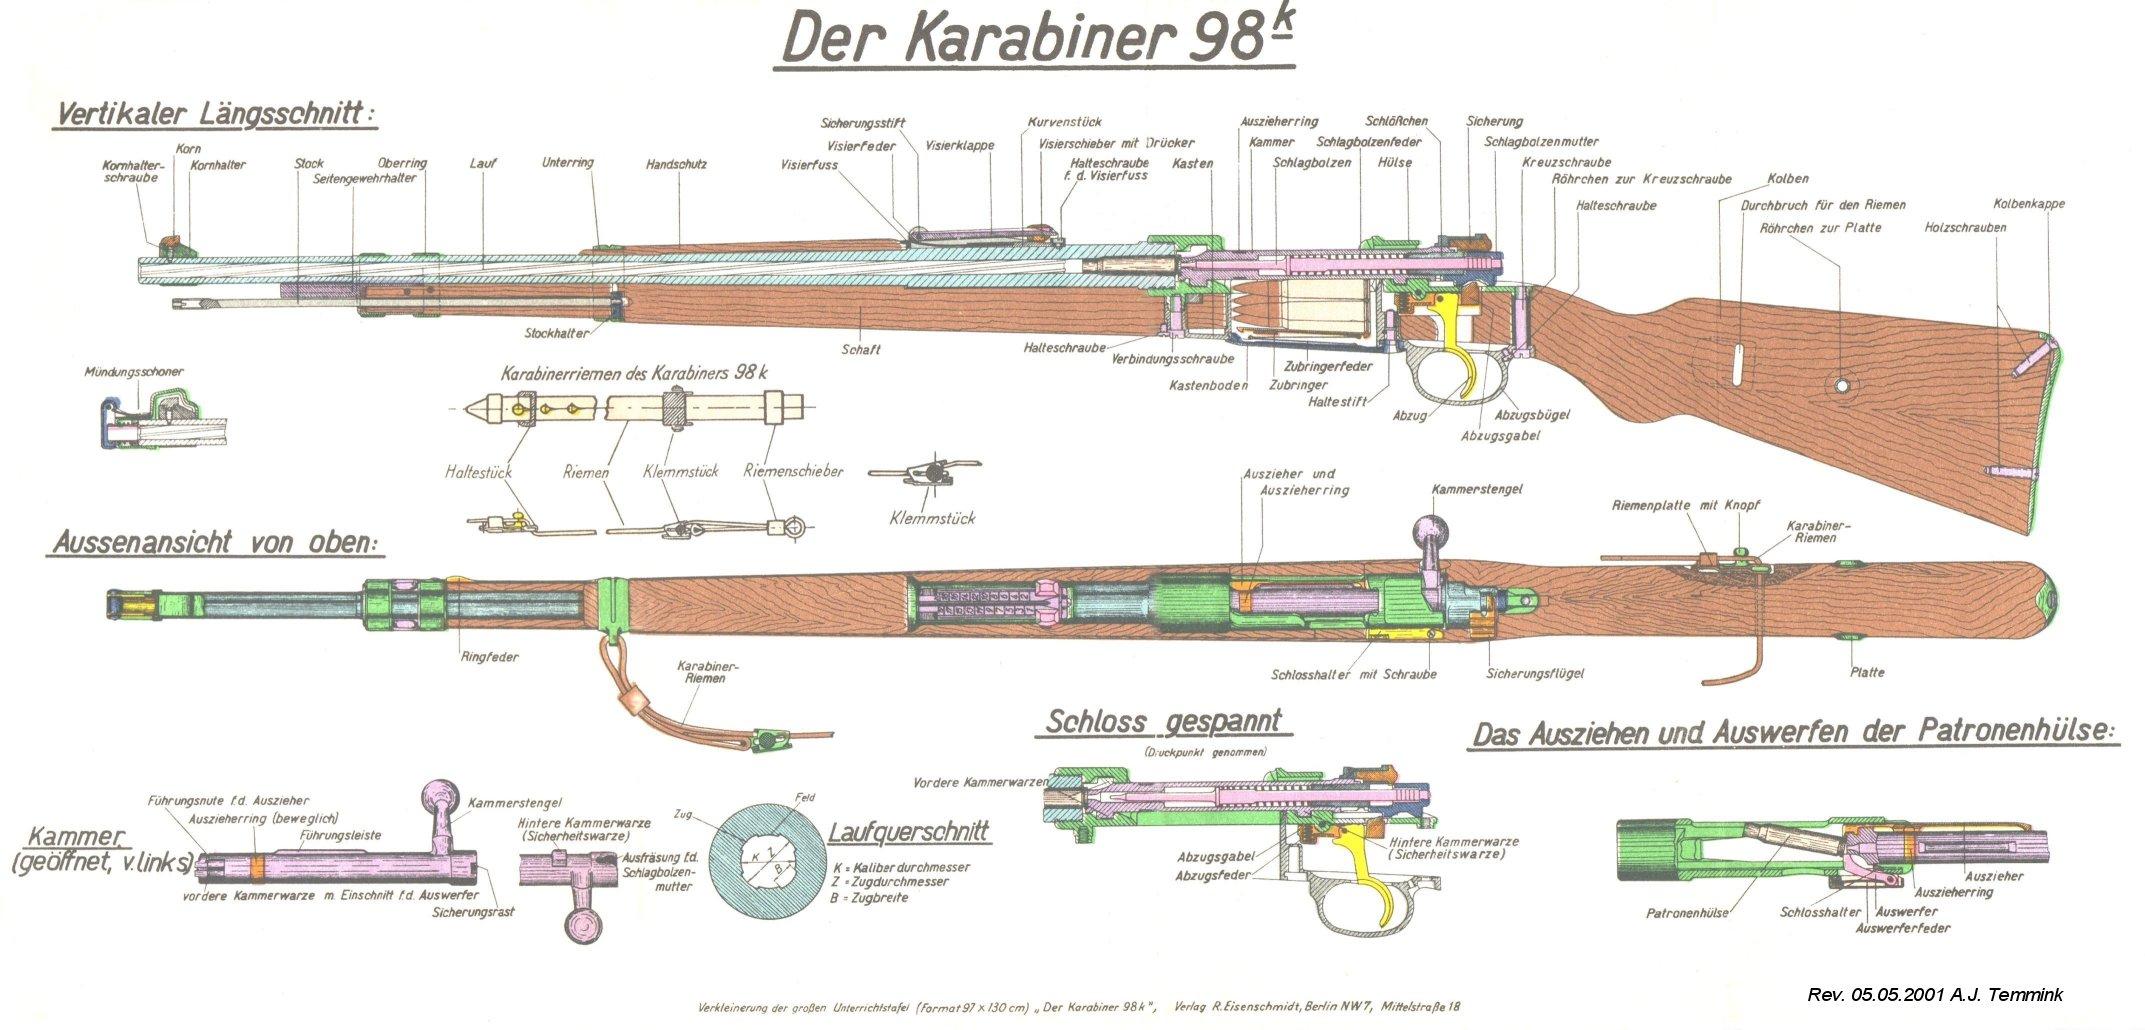 Karabiner 98k blueprint